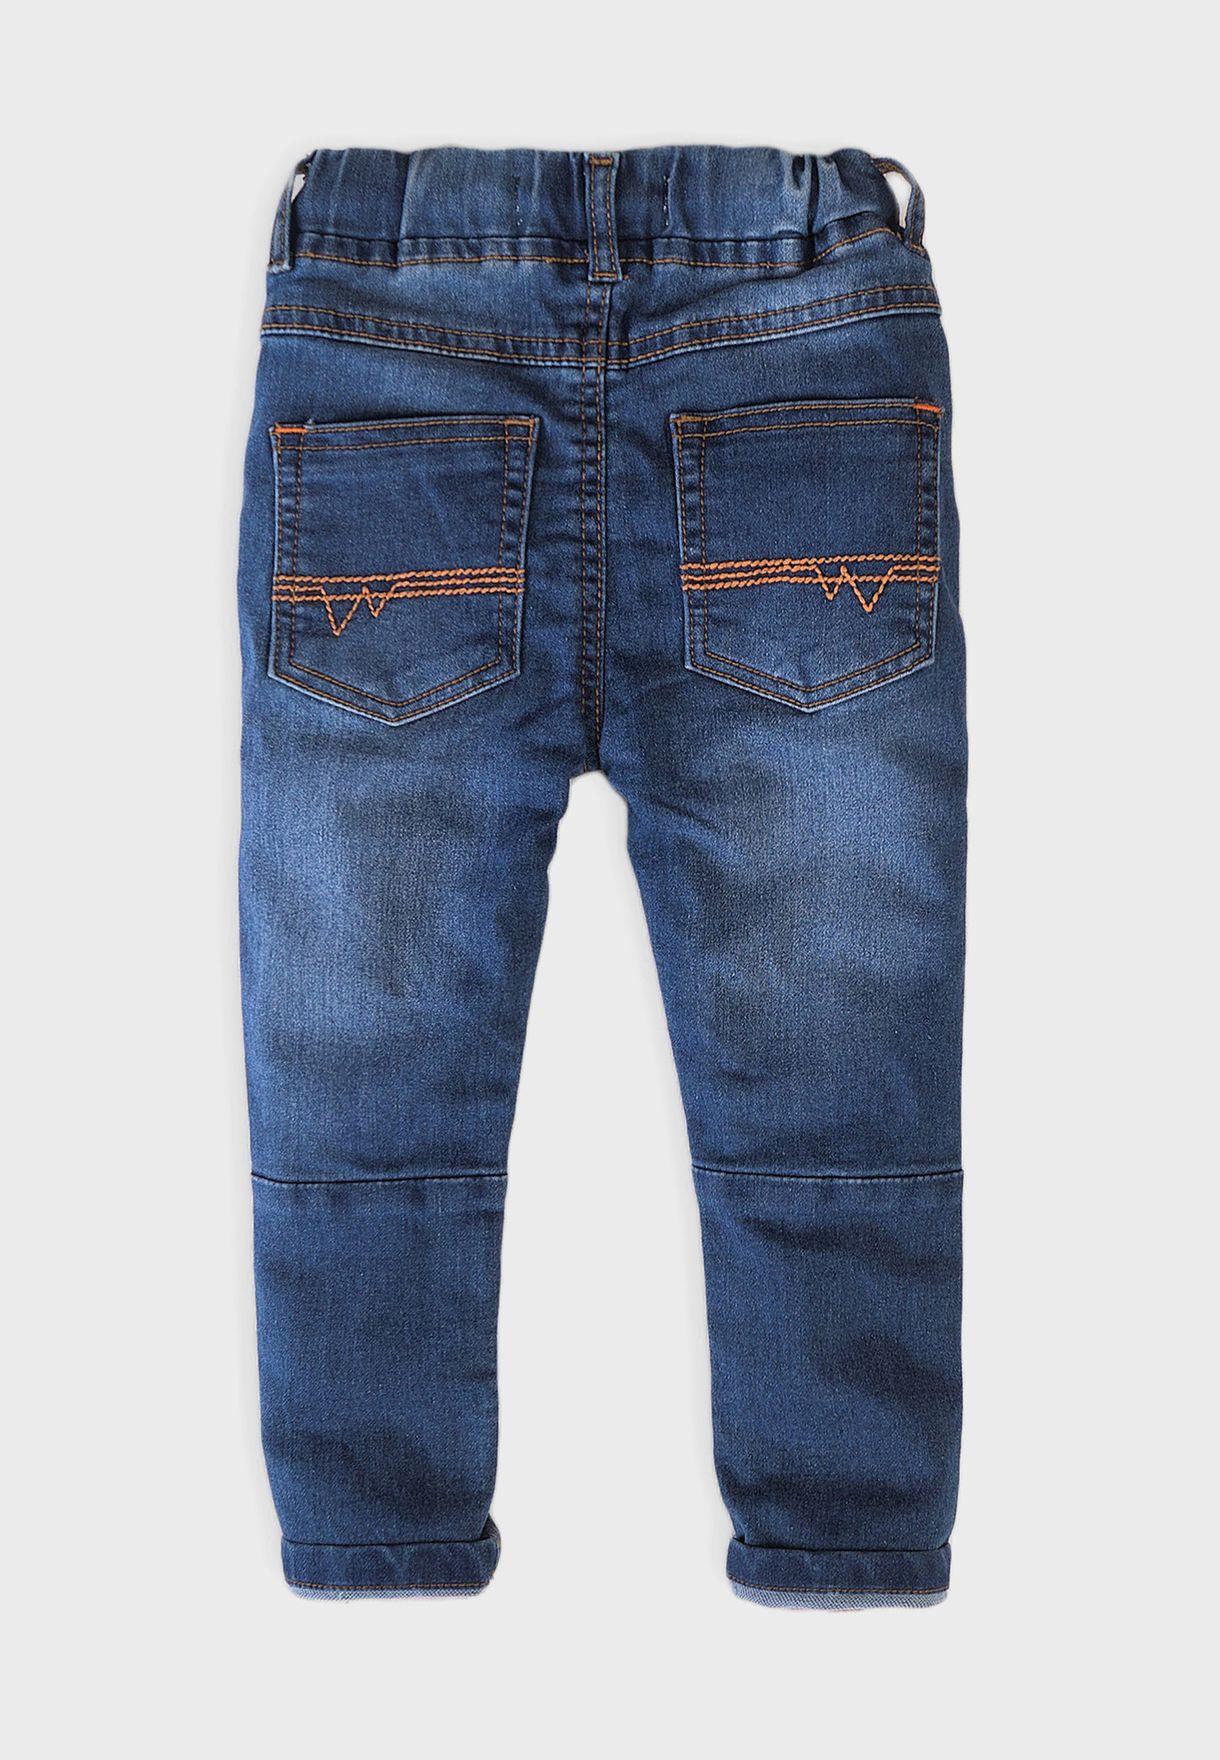 Kids Knitted Denim Jeans